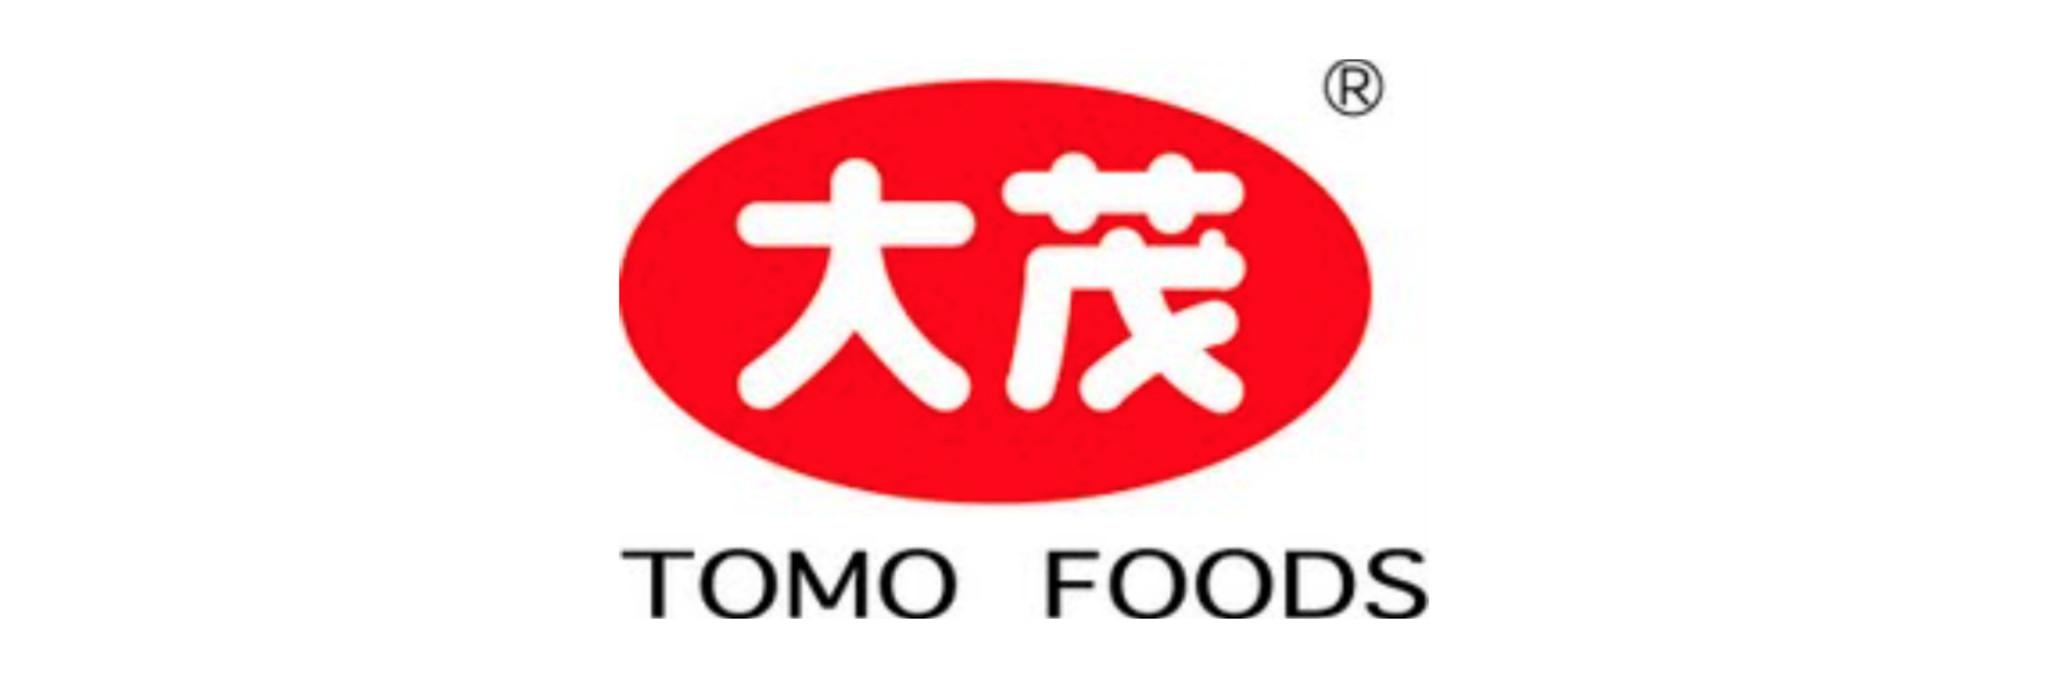 TOMO FOODS